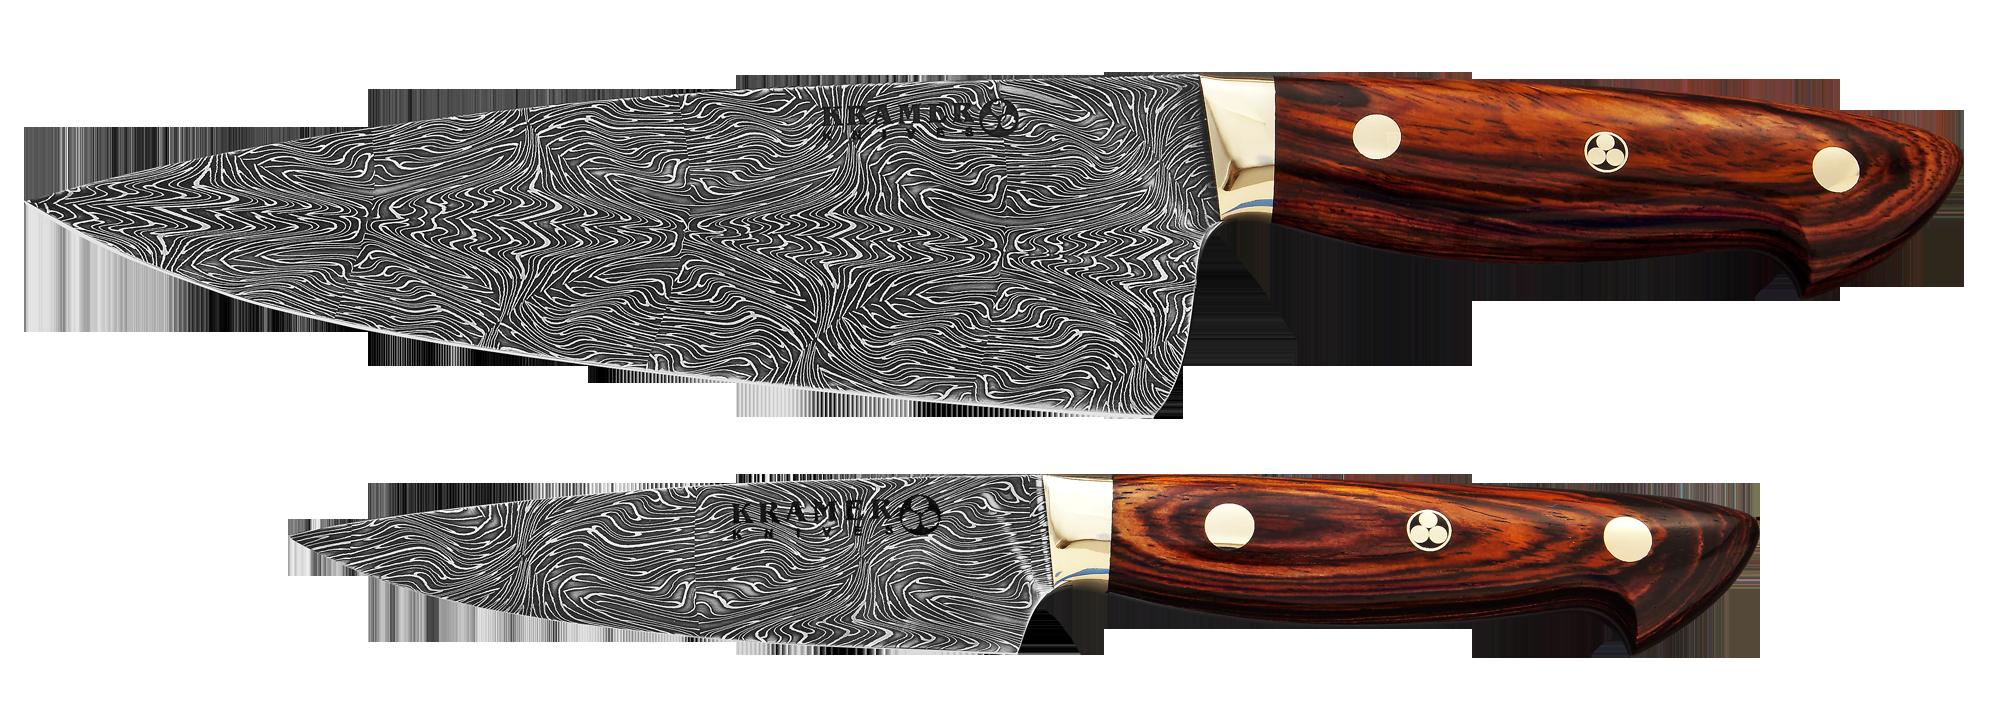 Bob Kramer Euro Chef & Utility Knives in Damascus Steel... | Kitchen Knives | Pinterest | Knives ...